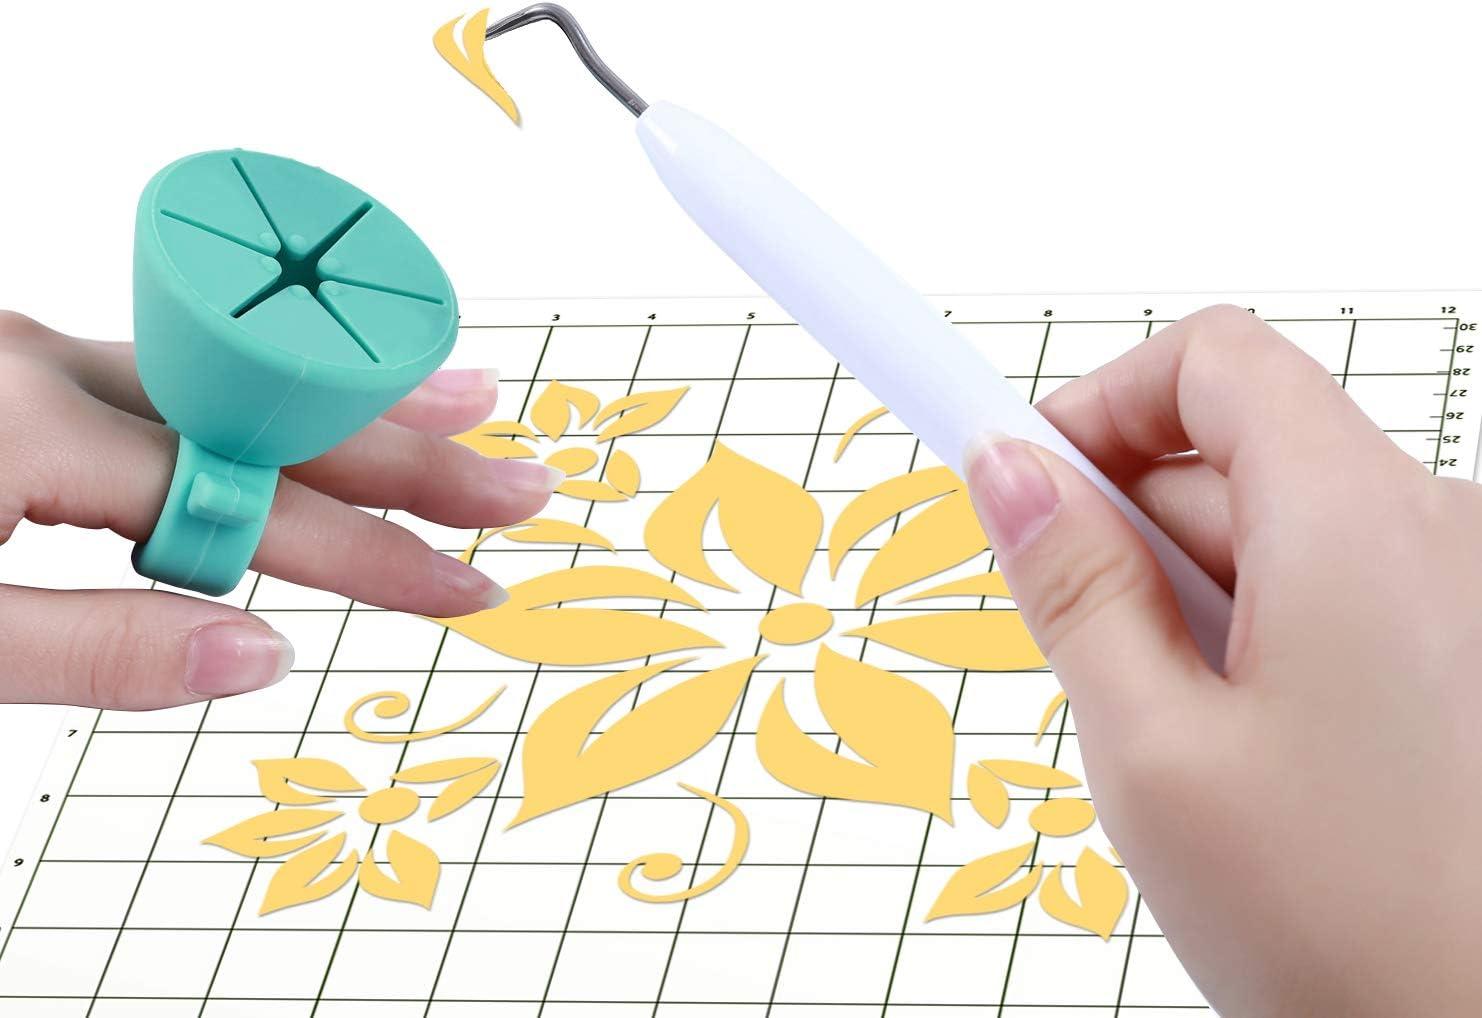 2 Pack Random Color Craft Weeding Vinyl Tools Accessories Remove Scraps for Cricut Silhouette Basic Tool Set